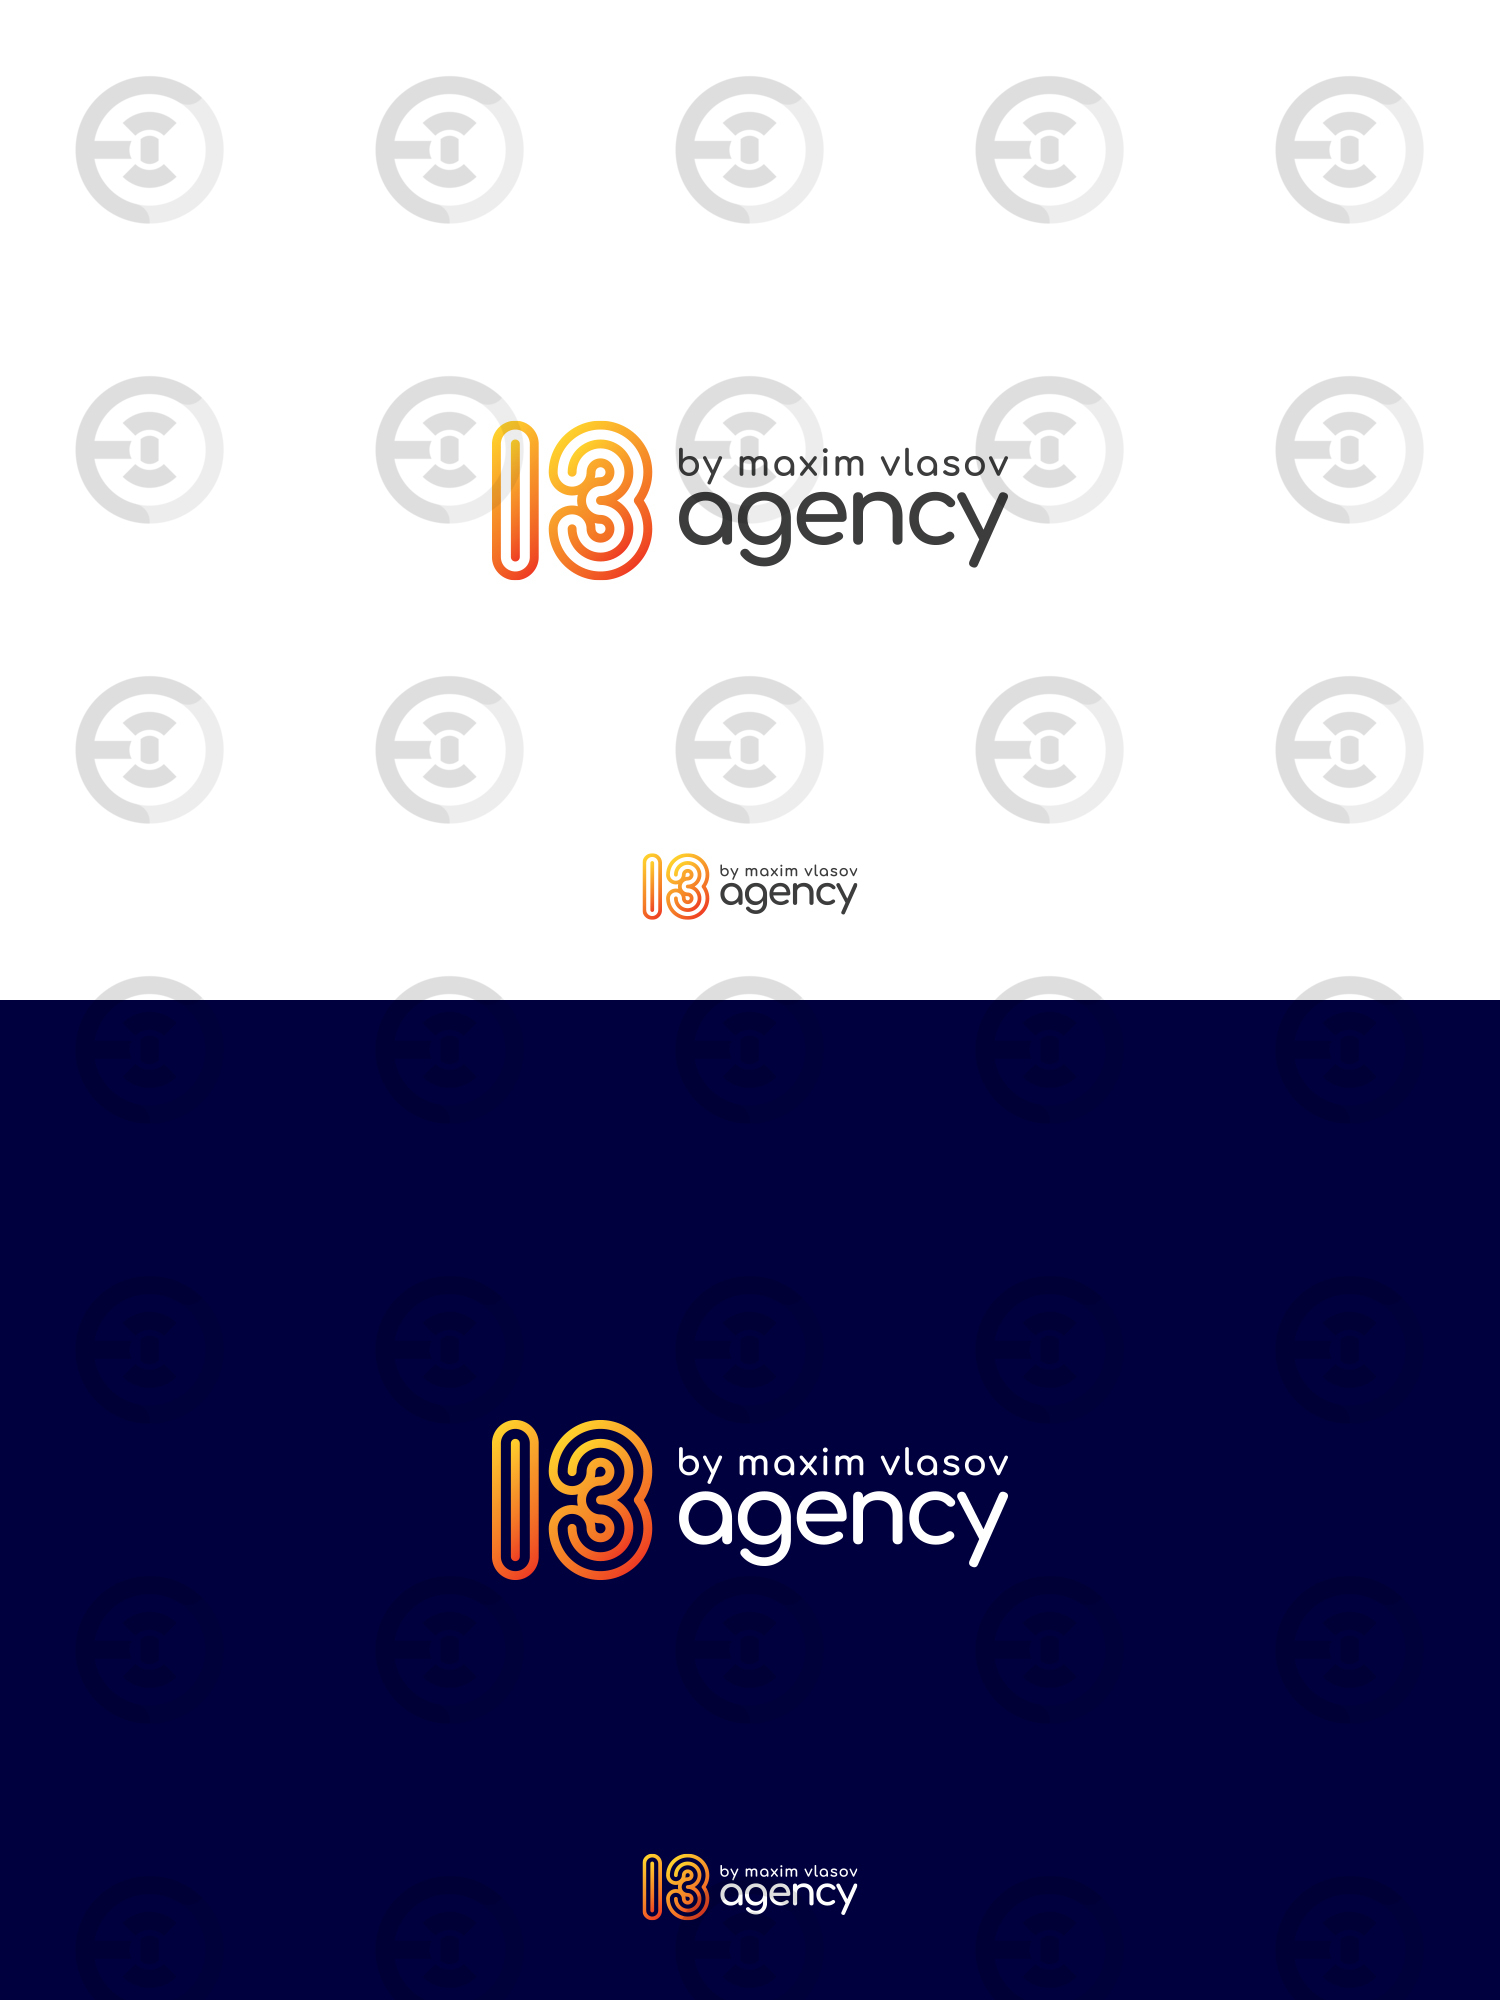 13 Agency Logo 7 By Gennady Savinov.jpg